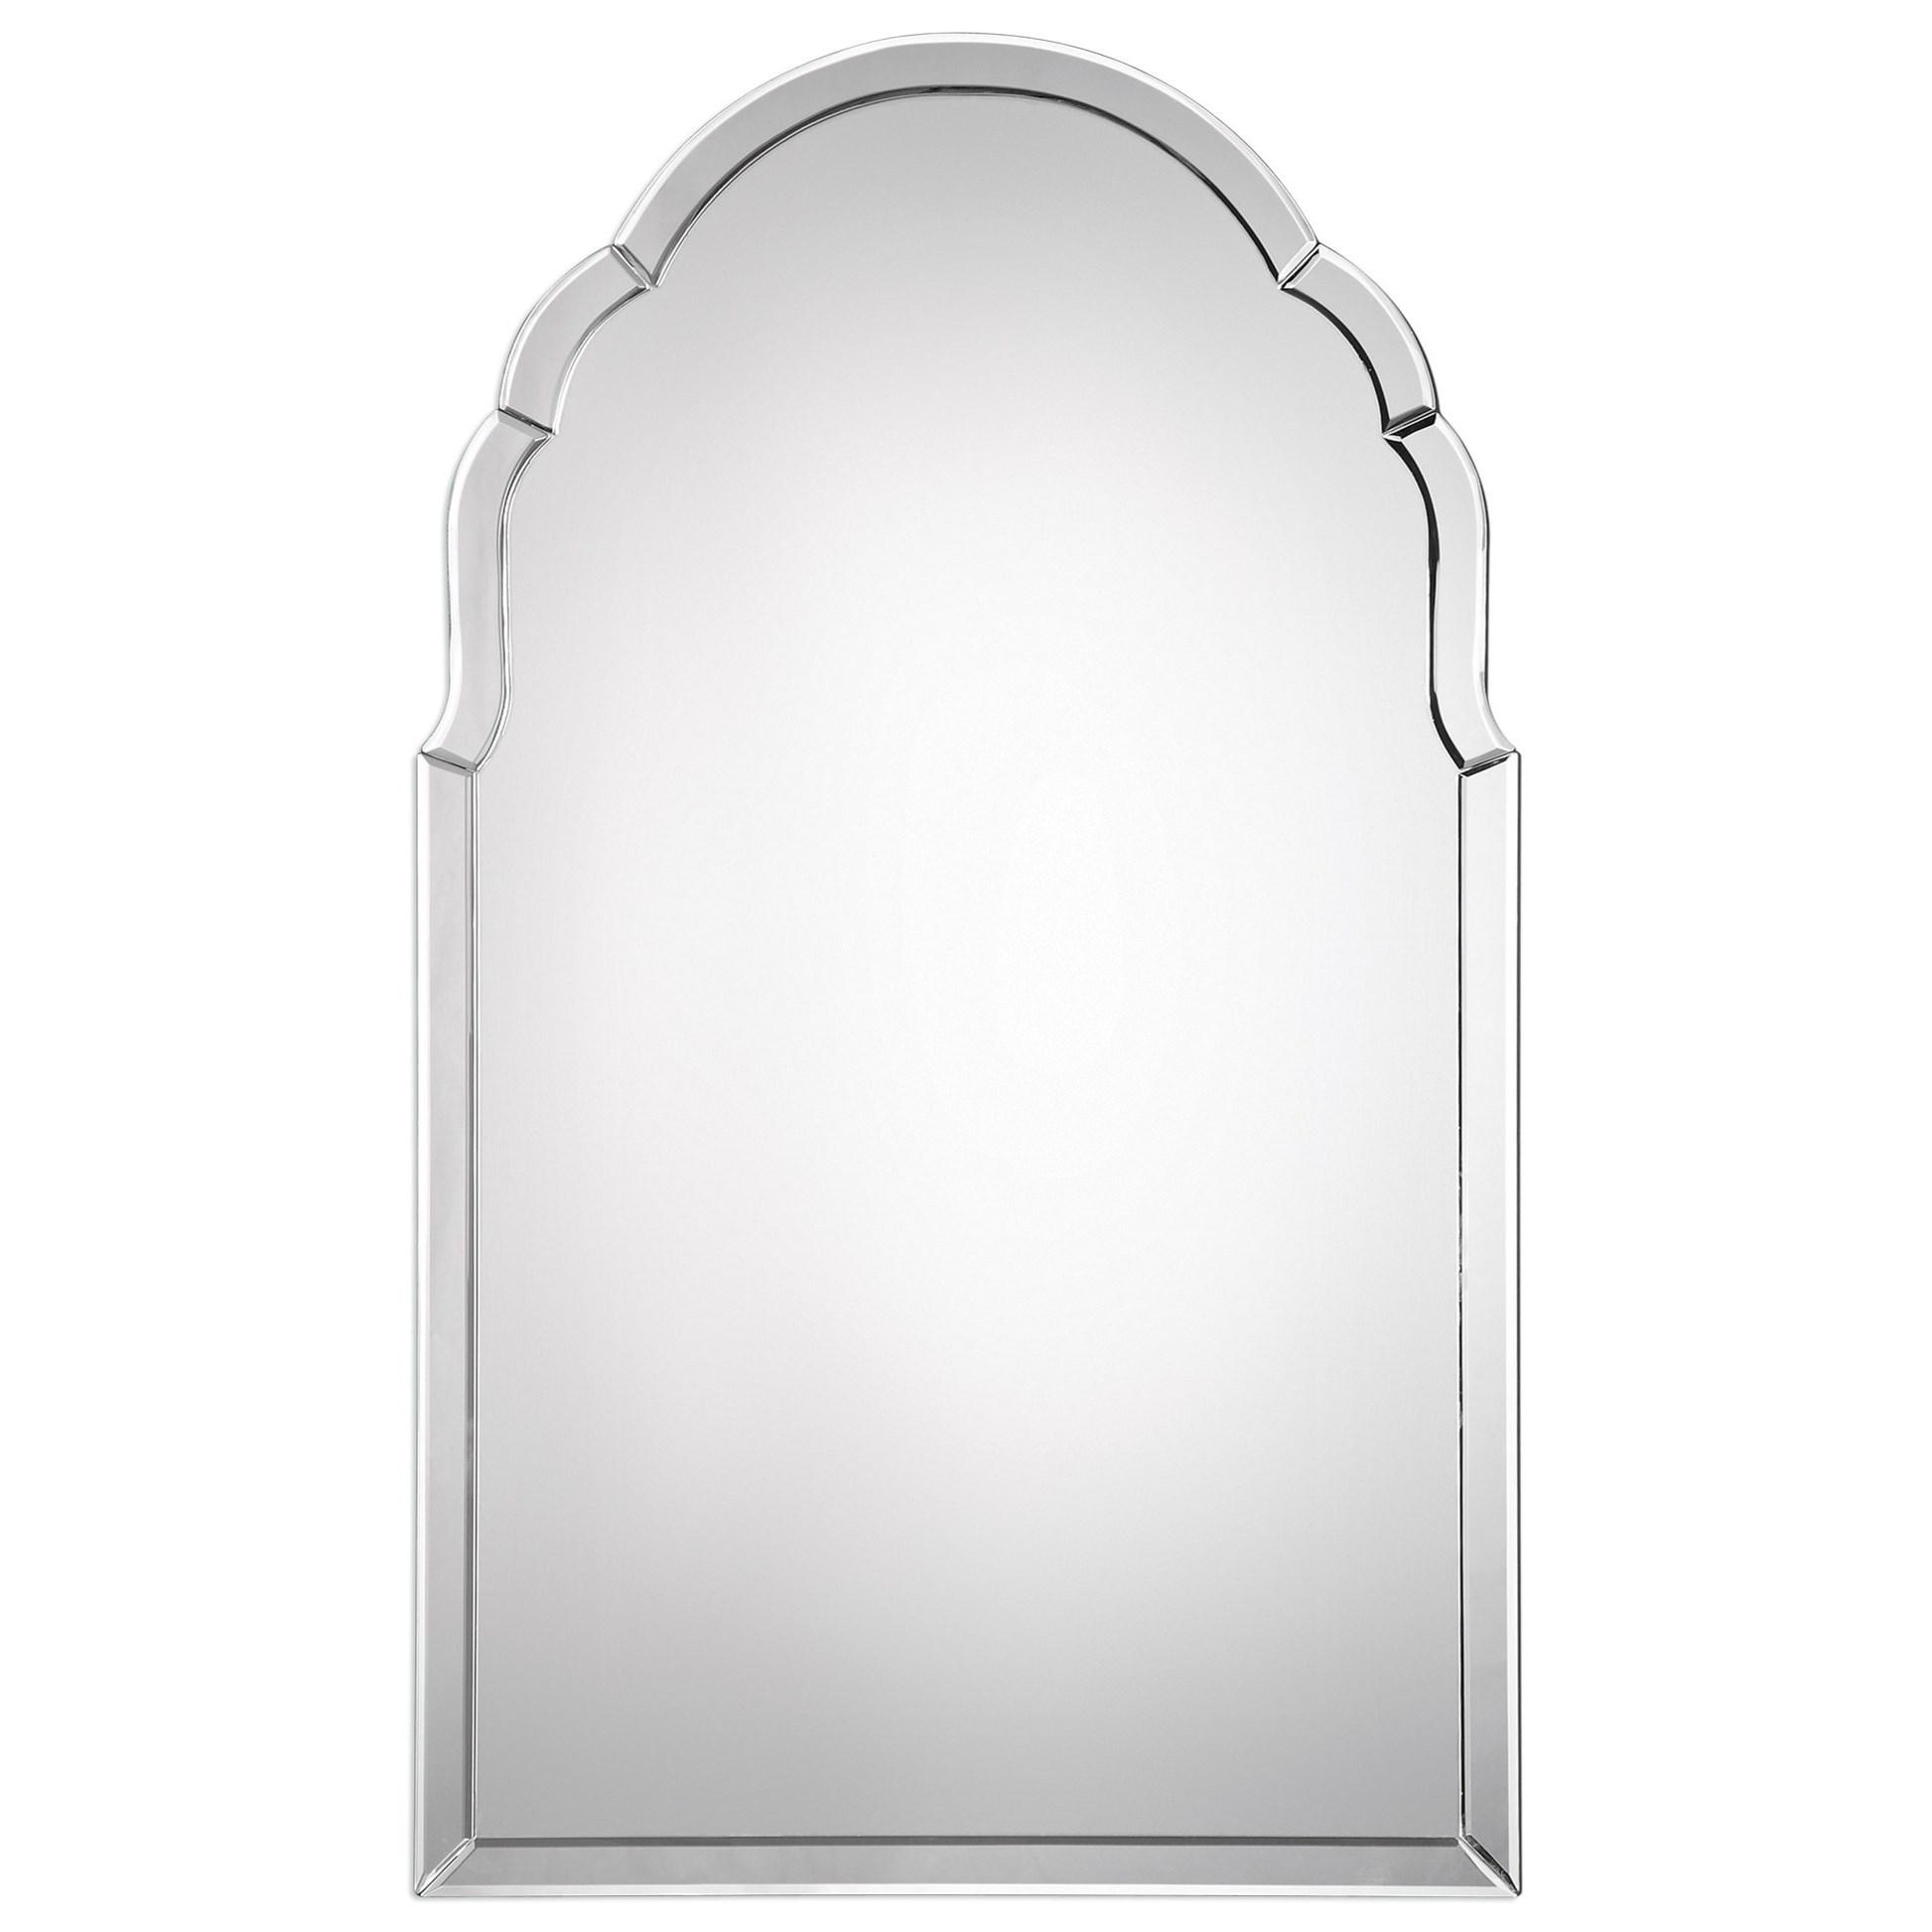 Mirrors Brayden Frameless by Uttermost at Wayside Furniture